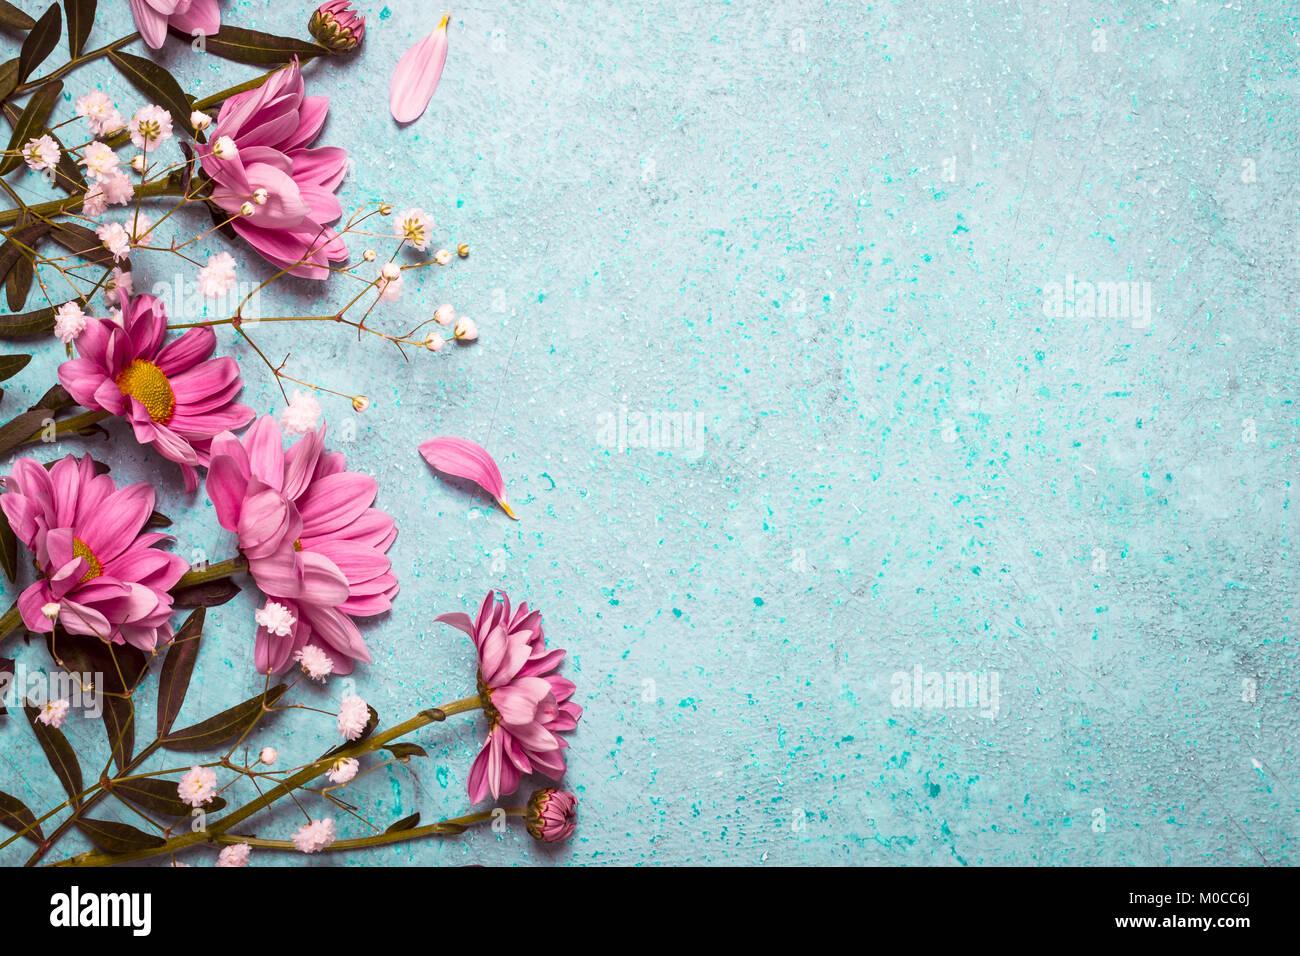 Primavera Verano Naturaleza Creativa De Fondo. Flores De